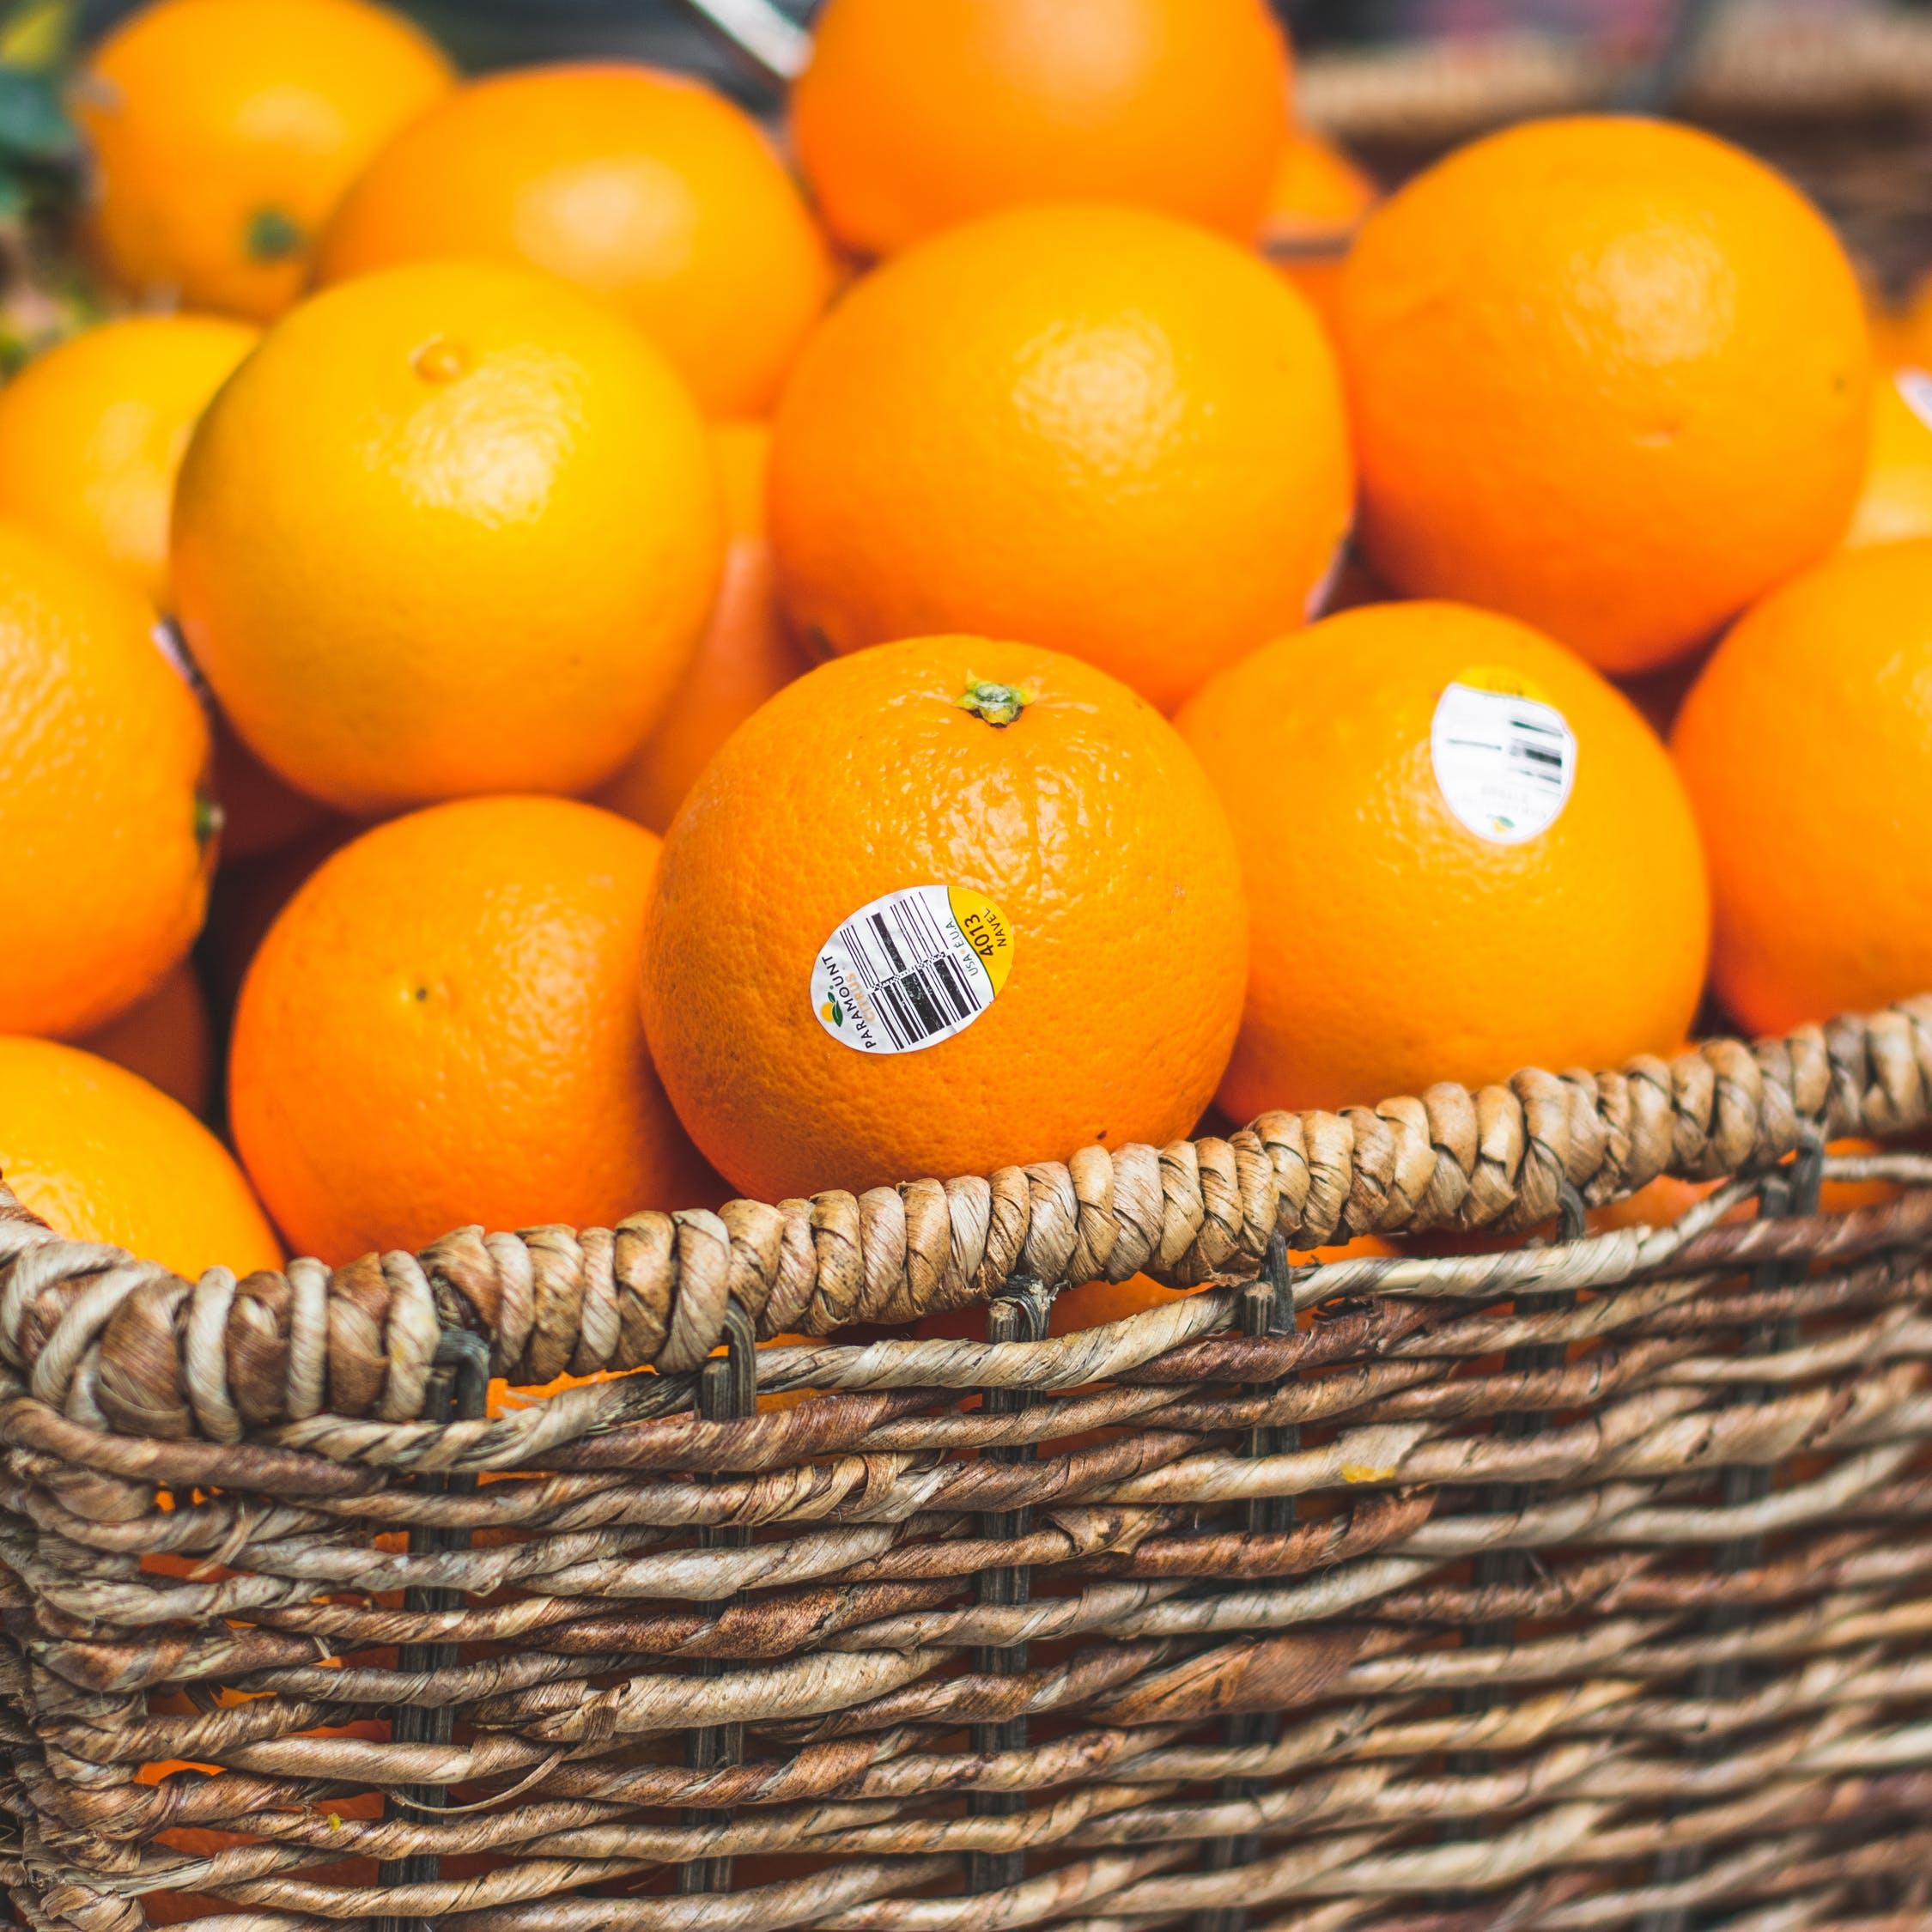 Oranges in an open basket, photo by Malcom Garret